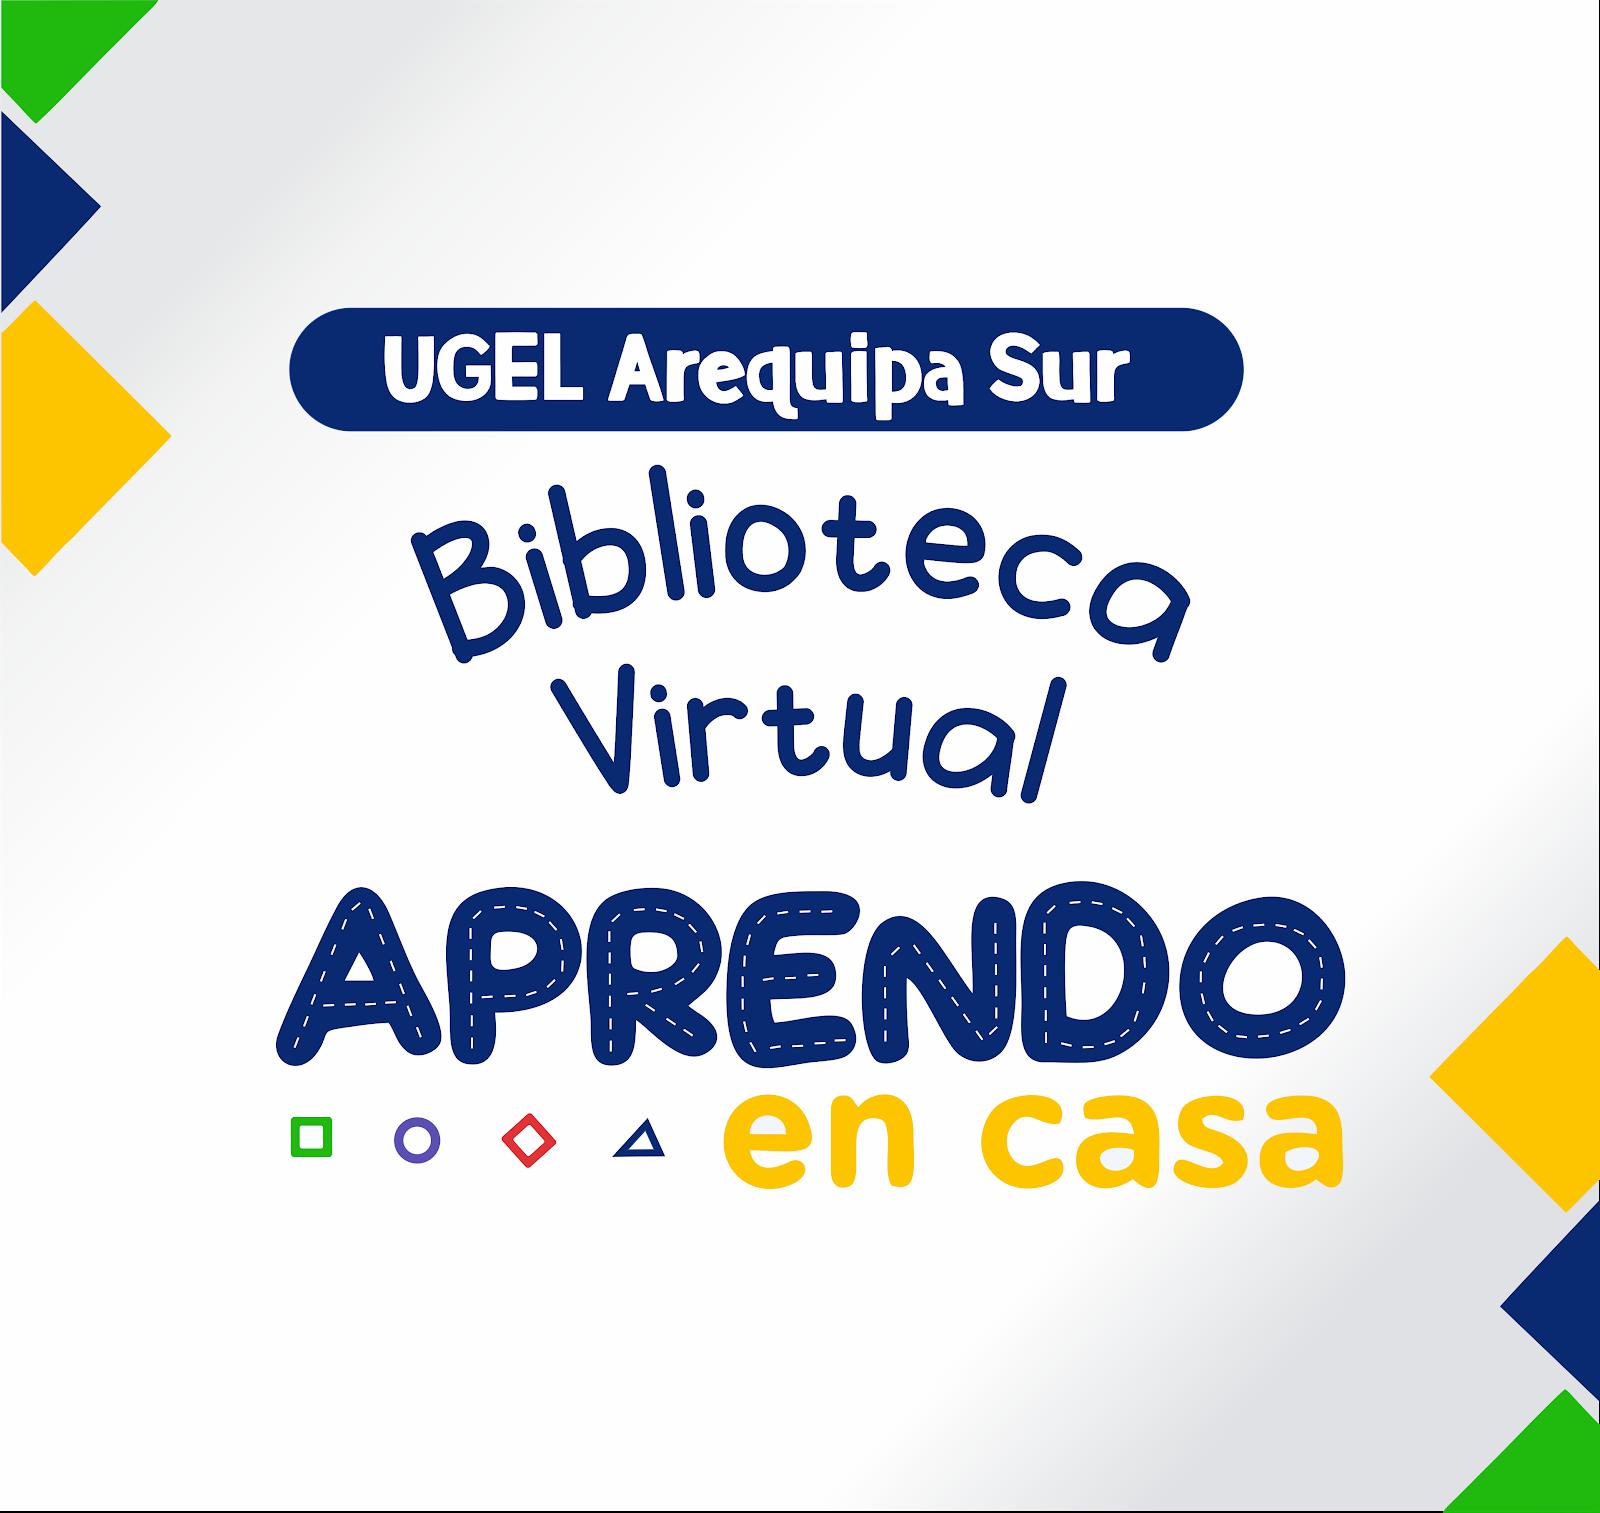 BIBLIOTECA VIRTUAL - TV PERU - APRENDO EN CASA